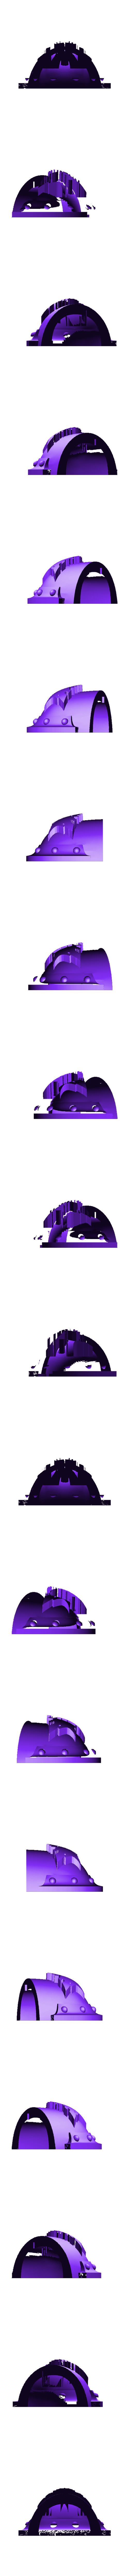 Morkai_Rep_MKV_and_VI_blank_2_Pad.stl Download free STL file Double Wolf head Chapter insignia • 3D printing model, Tatsura